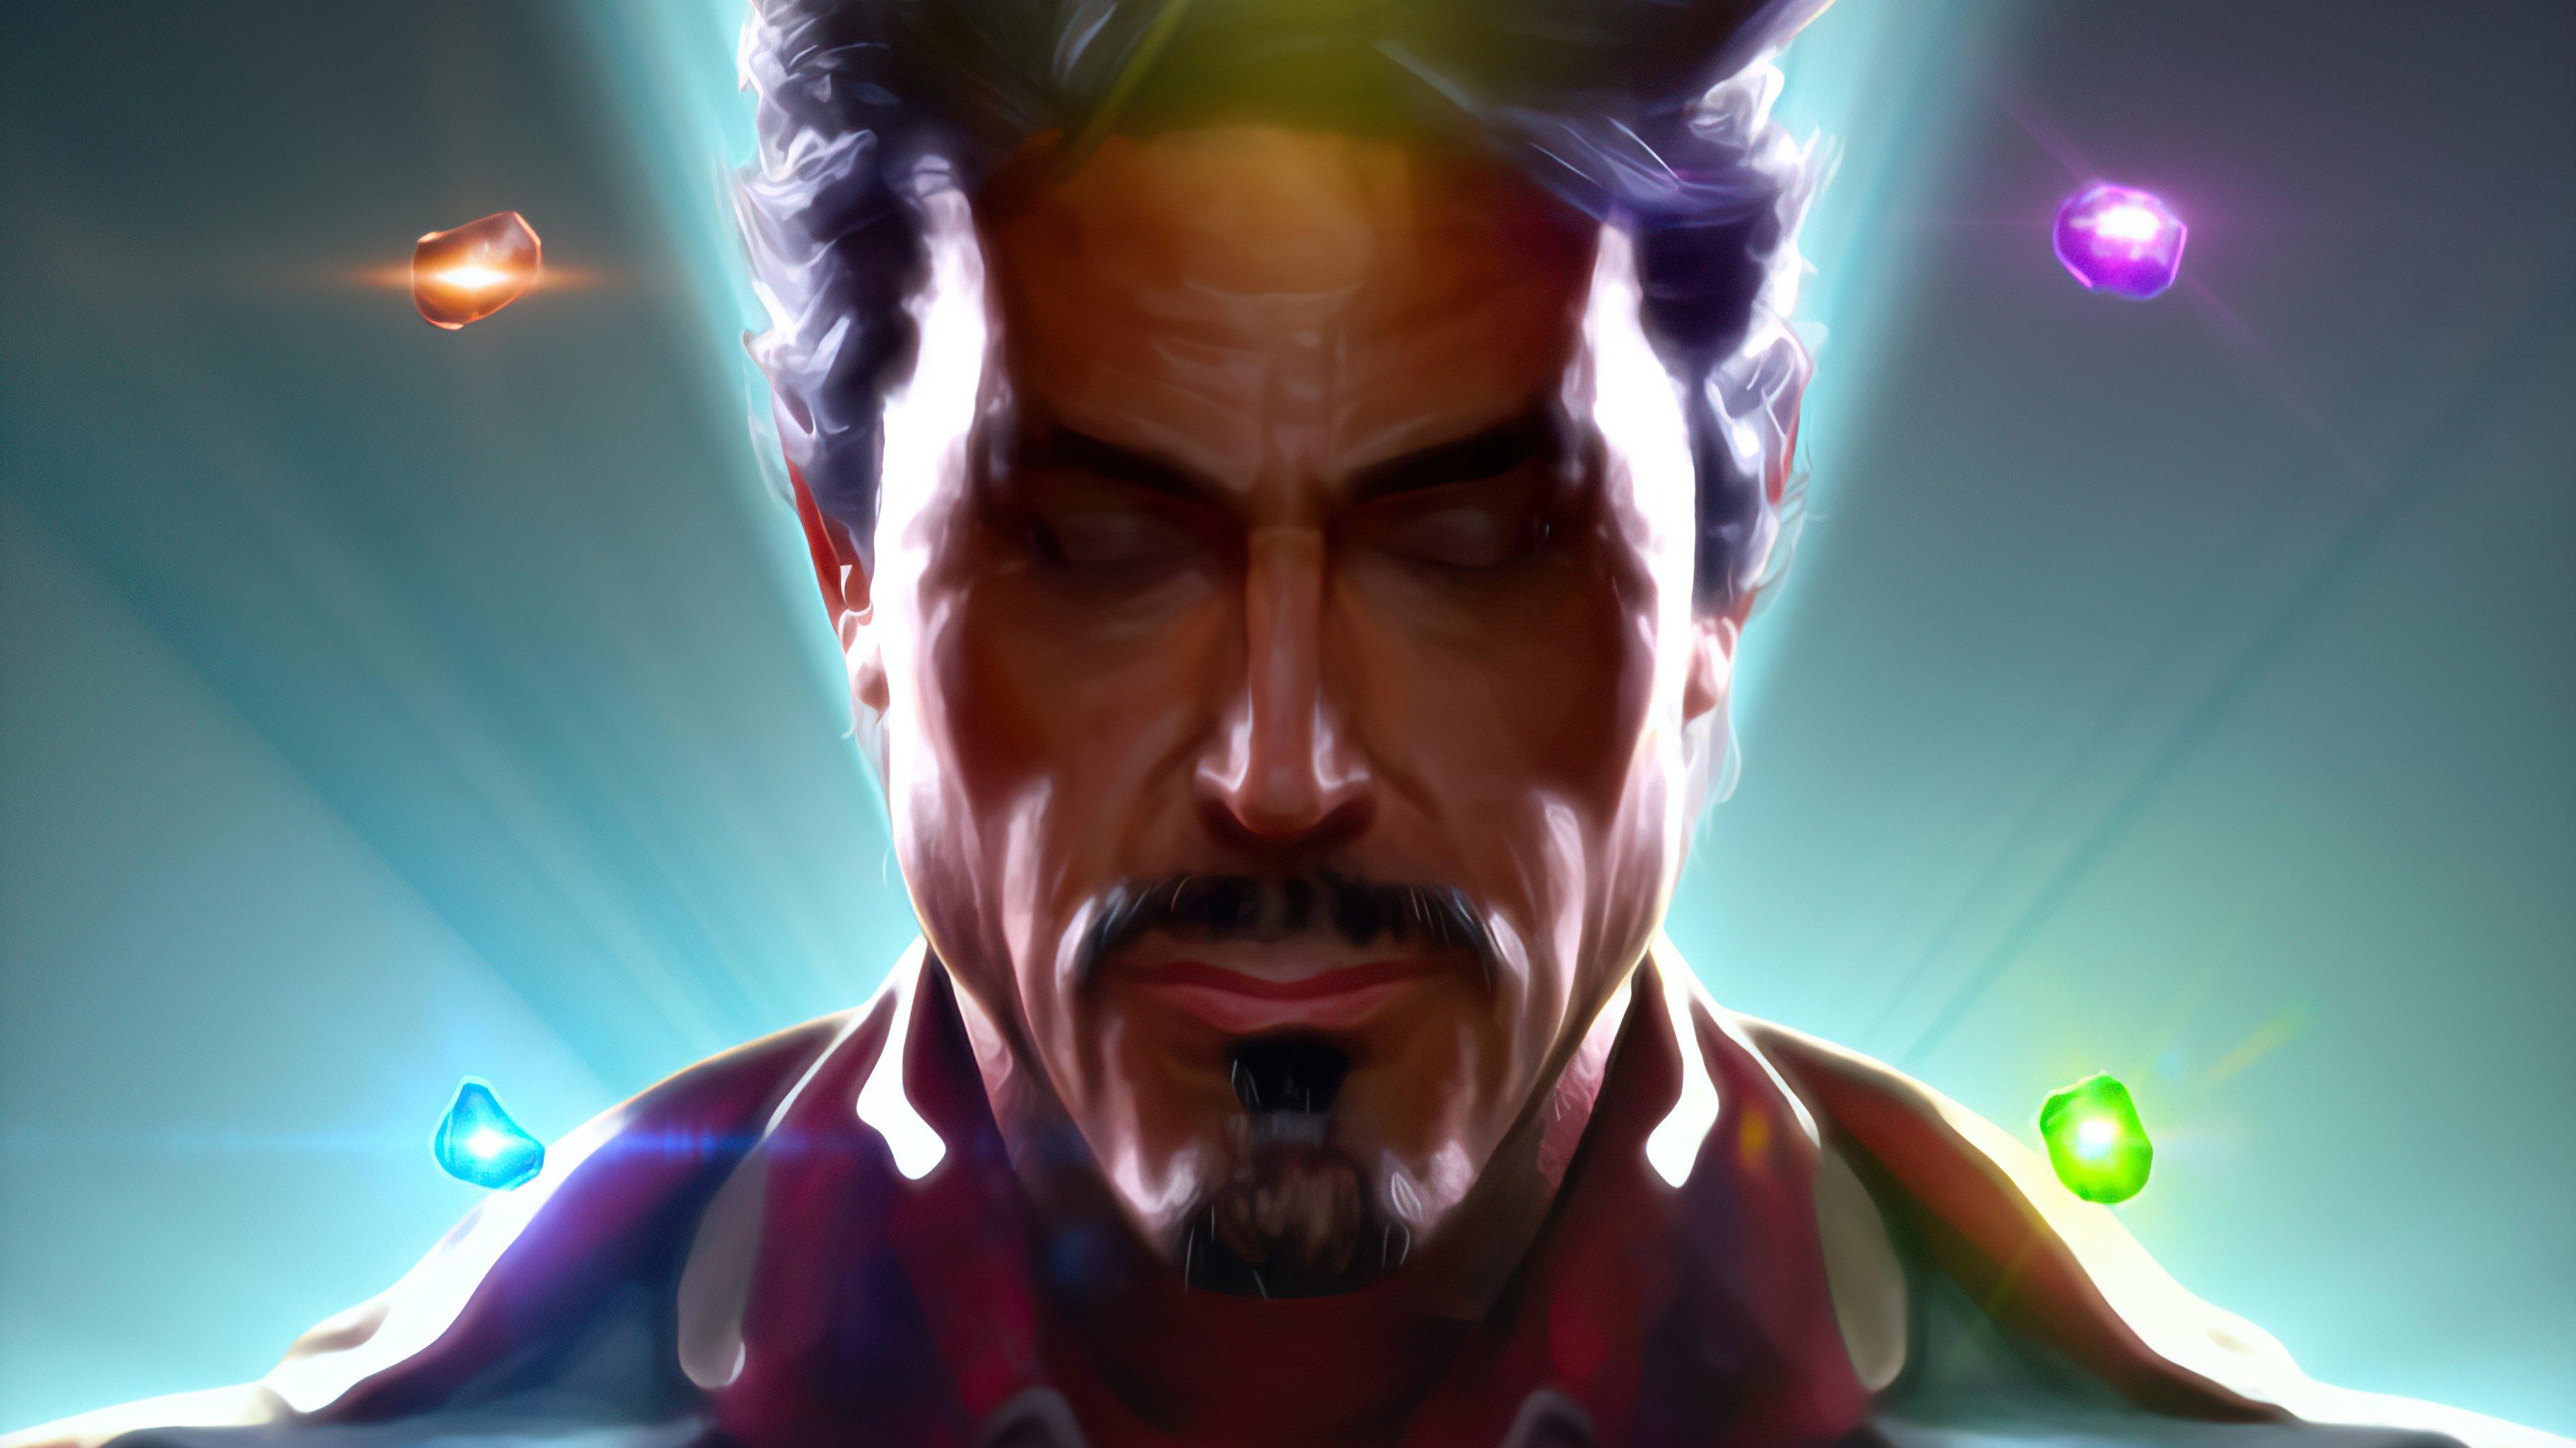 Wallpaper Irom man with Infinity gems